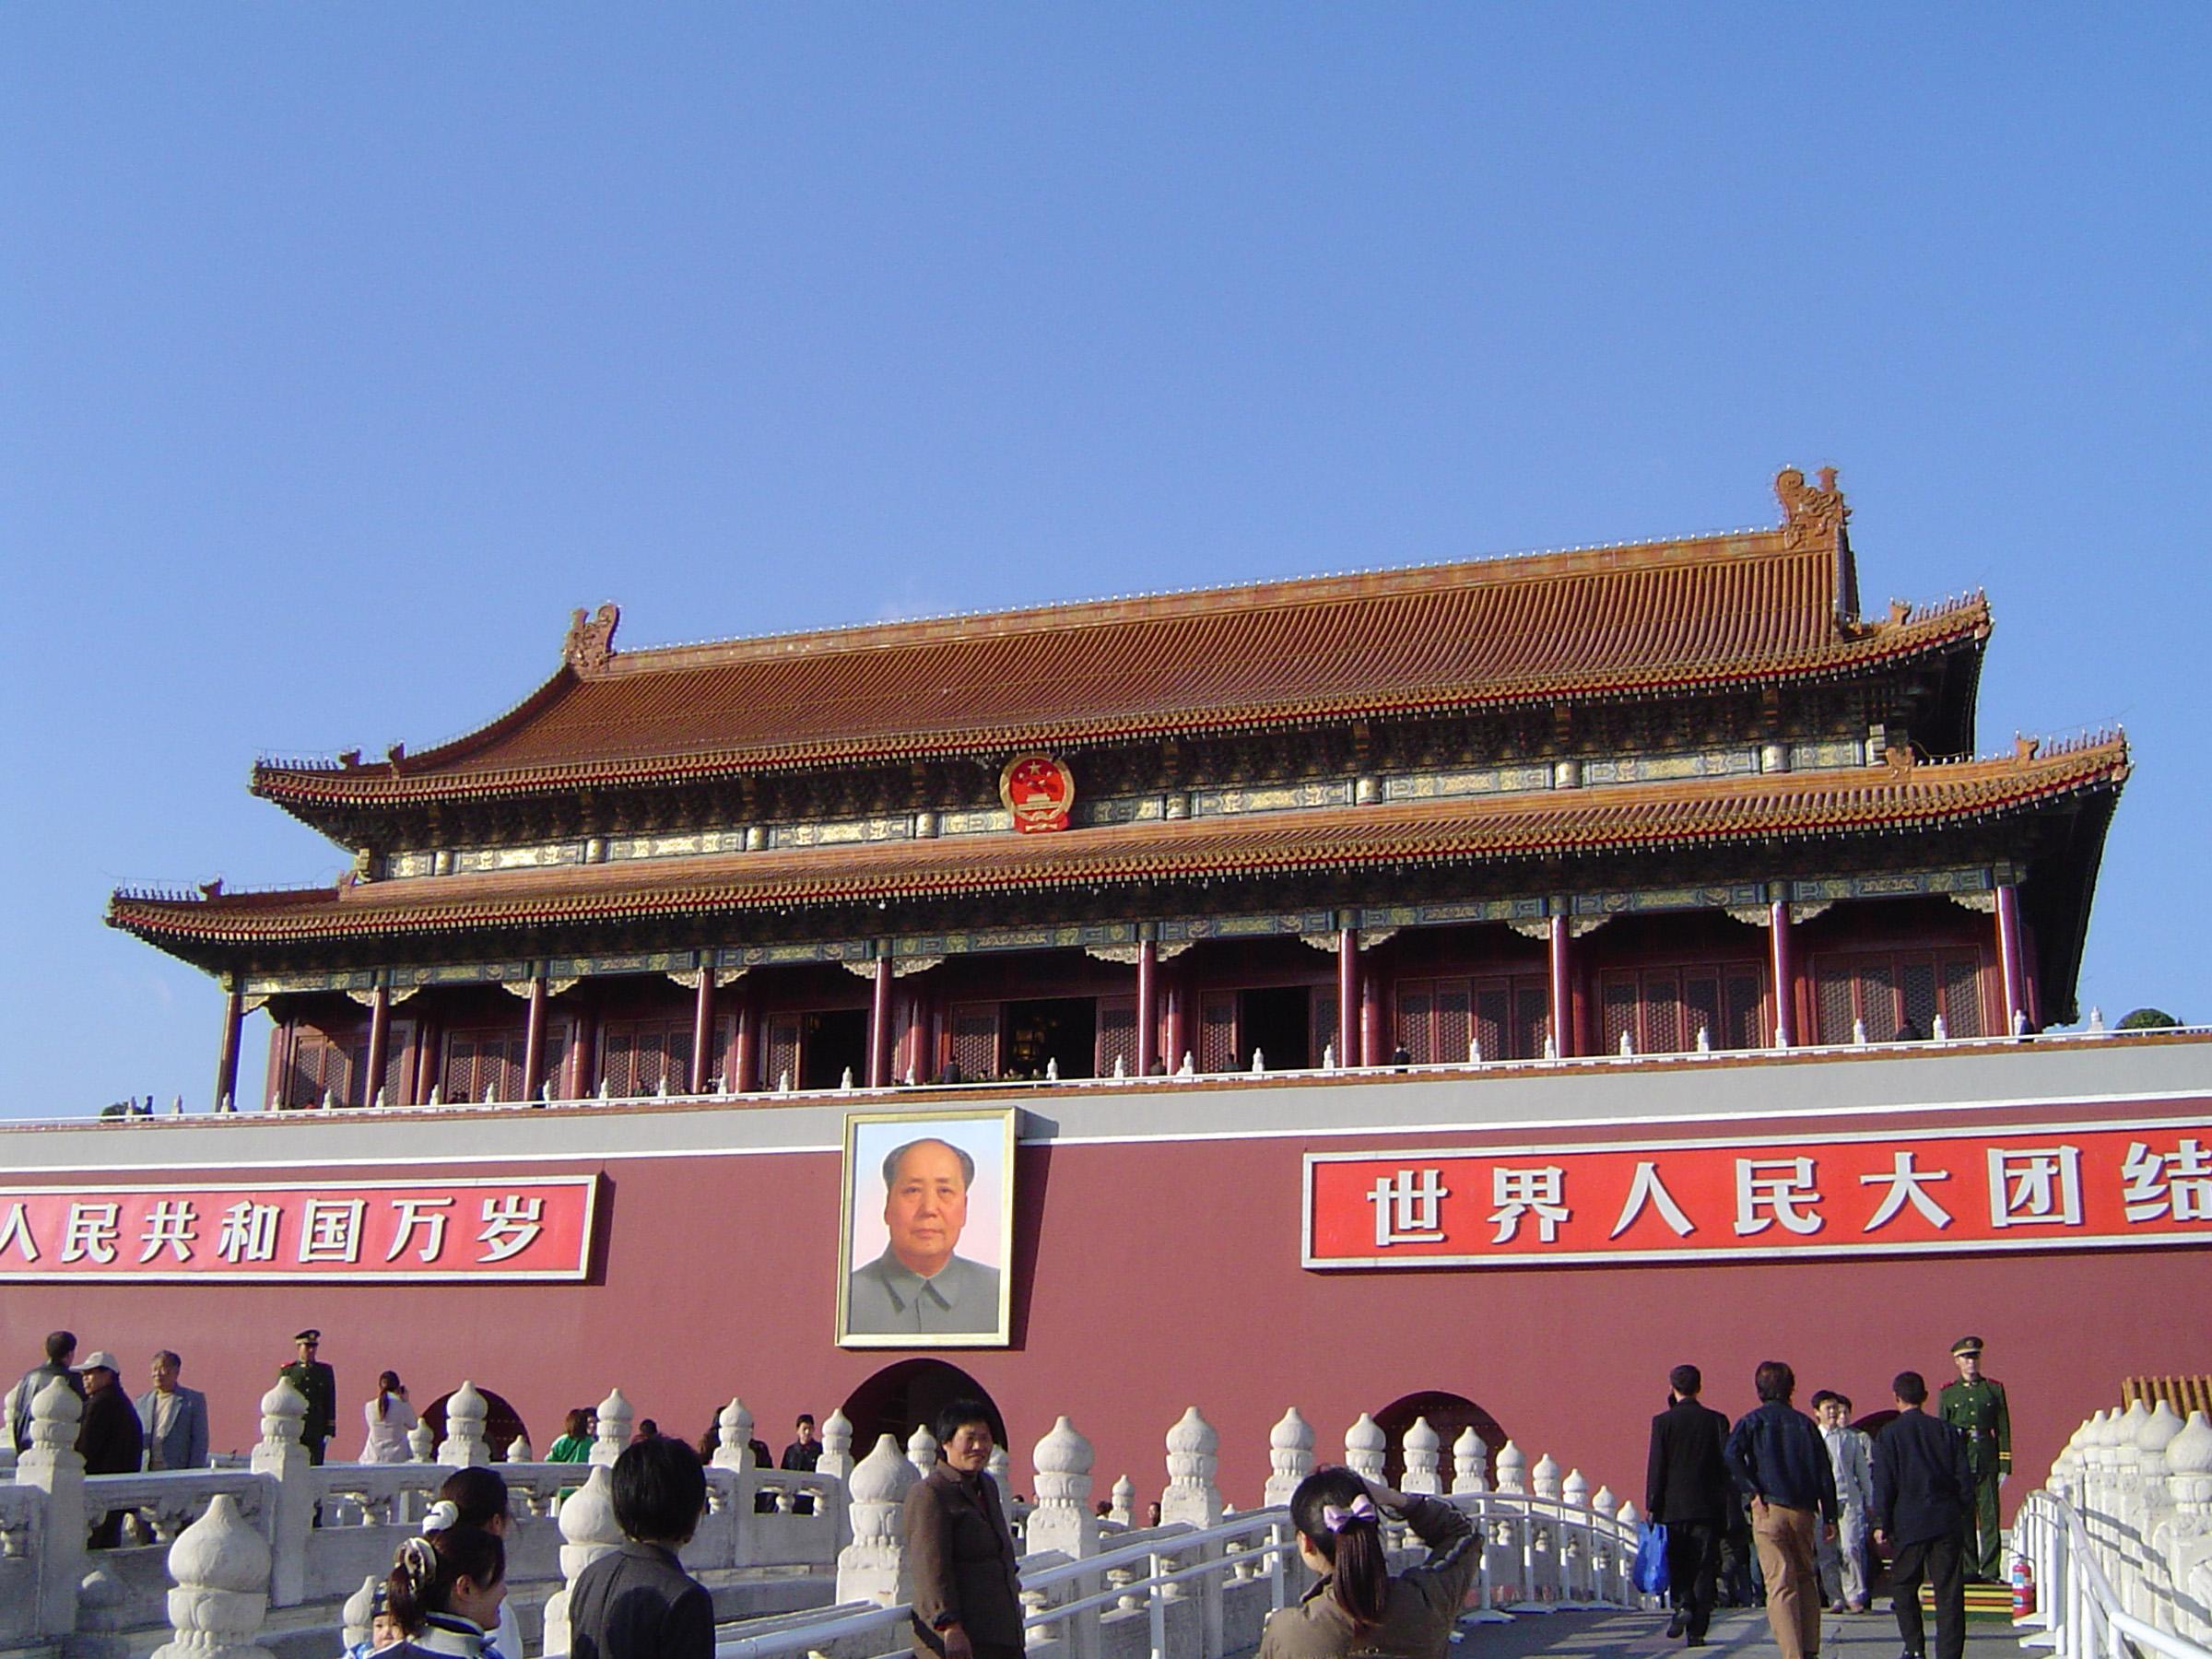 Visiter la Cité interdite au coeur de Pékin